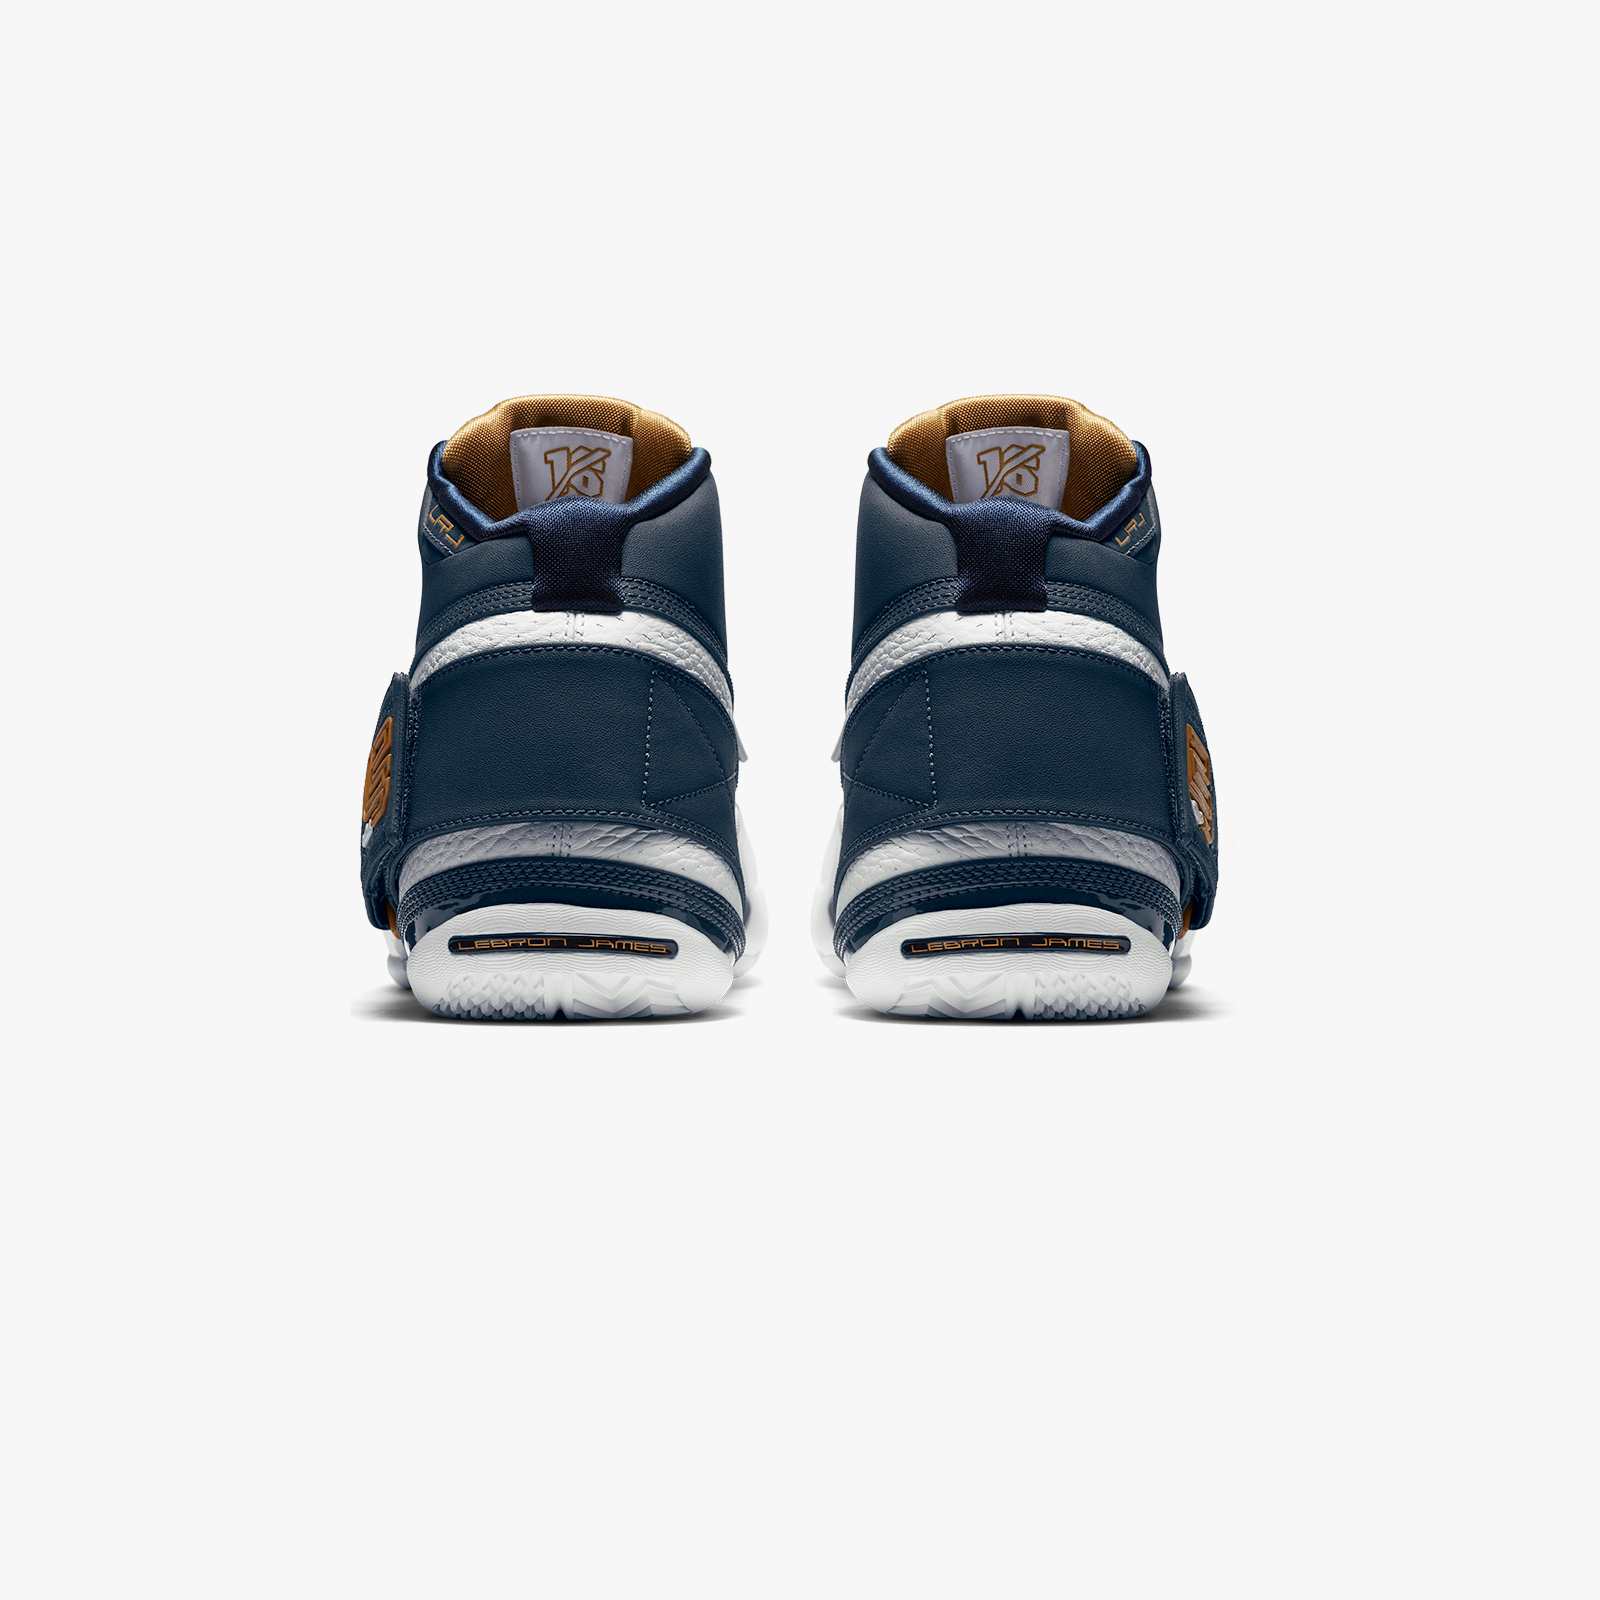 73dcd18fcf3 Nike Zoom LeBron Soldier CT16 QS - Ao2088-400 - Sneakersnstuff ...